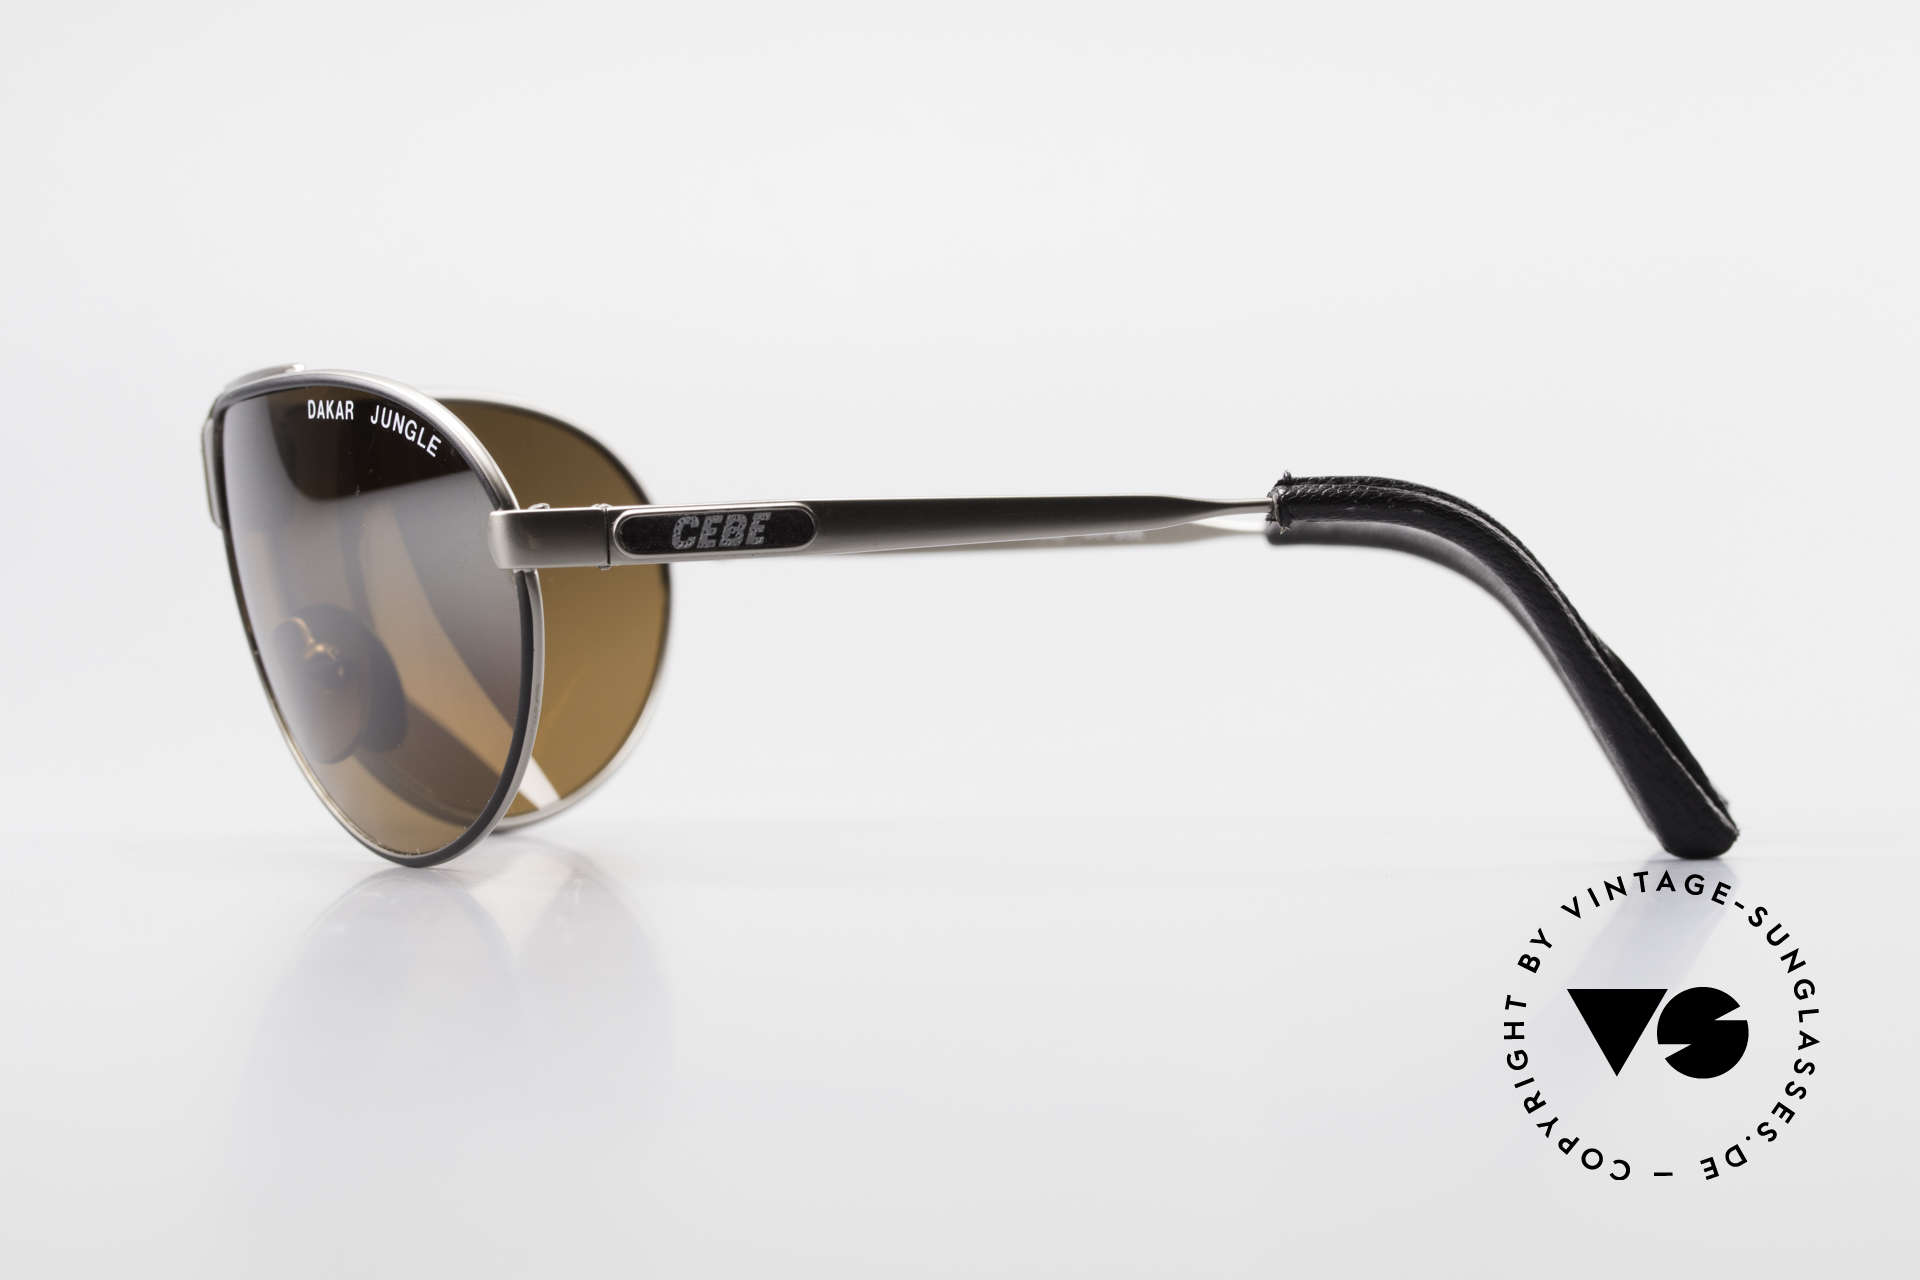 Cebe Dakar Jungle QD02 High-Tech Racing Sunglasses, mirrored cebonate lenses; made for extreme sun intensity, Made for Men and Women